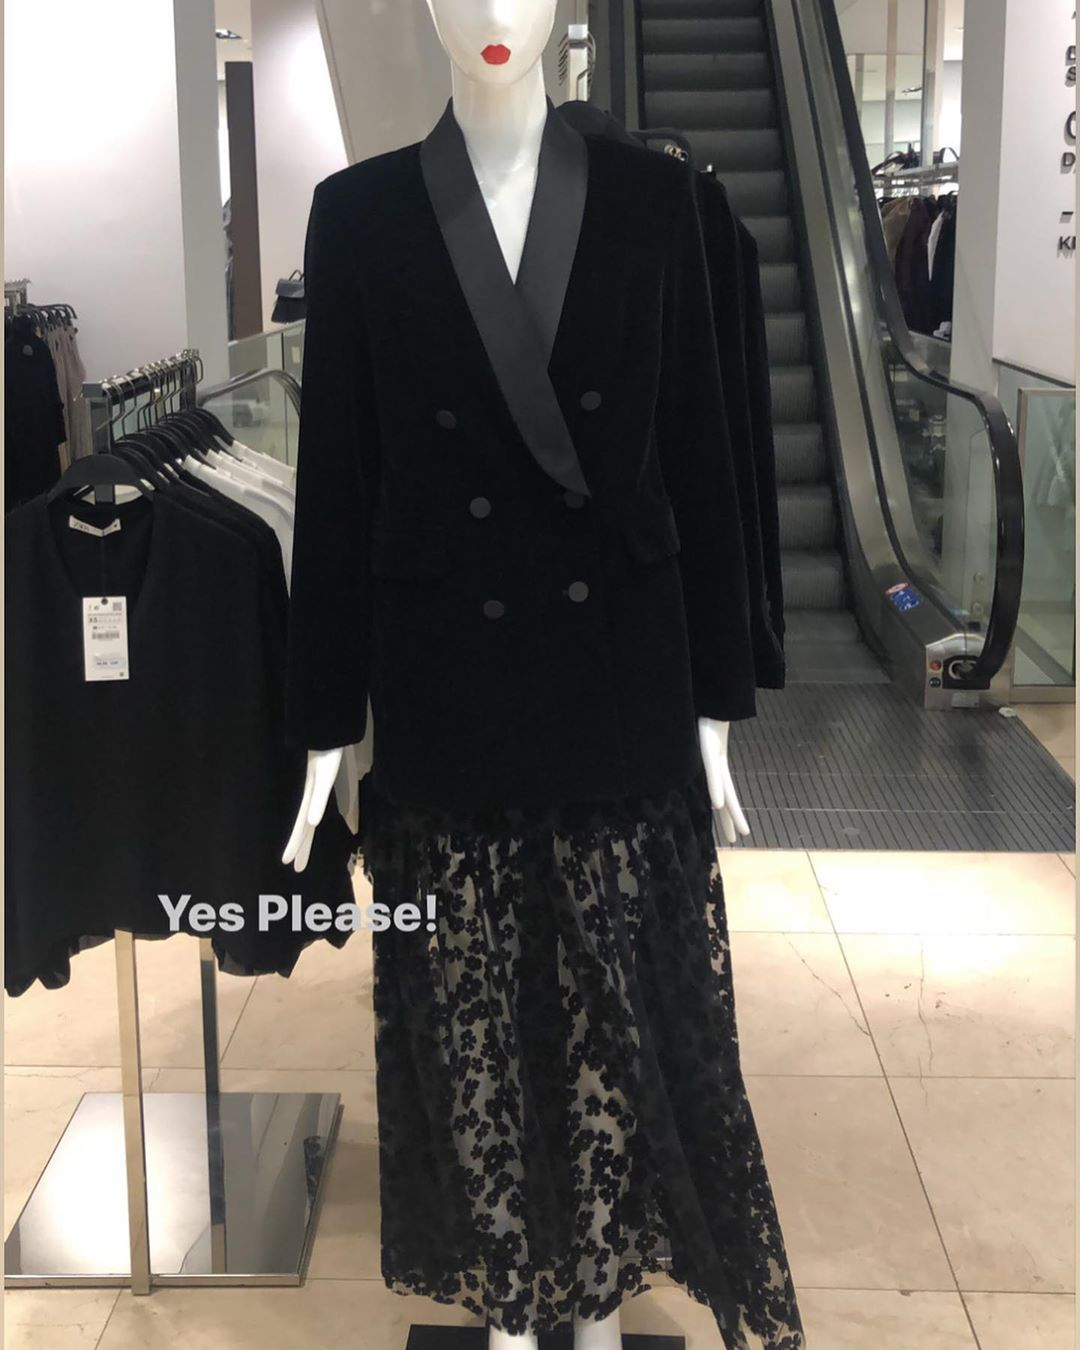 Zara Kombin Transparan Elbise 29995 Kadife Blazer 49995 In 2020 Fashion Zara Zara Women